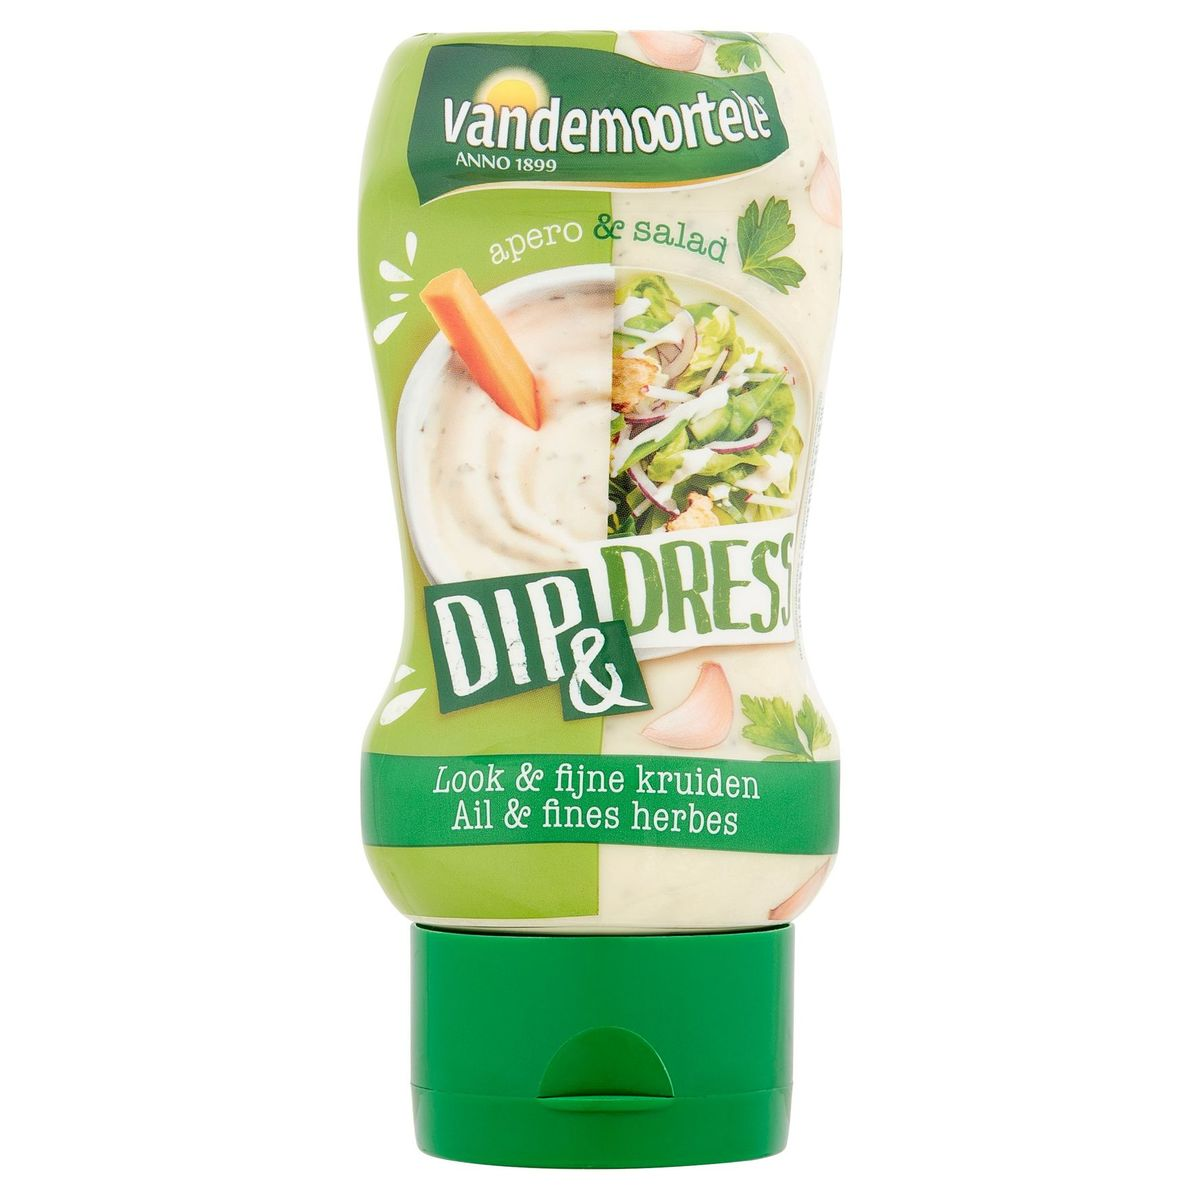 Vandemoortele Apero & Salad Dip & Dress Ail & Fines Herbes 250 ml